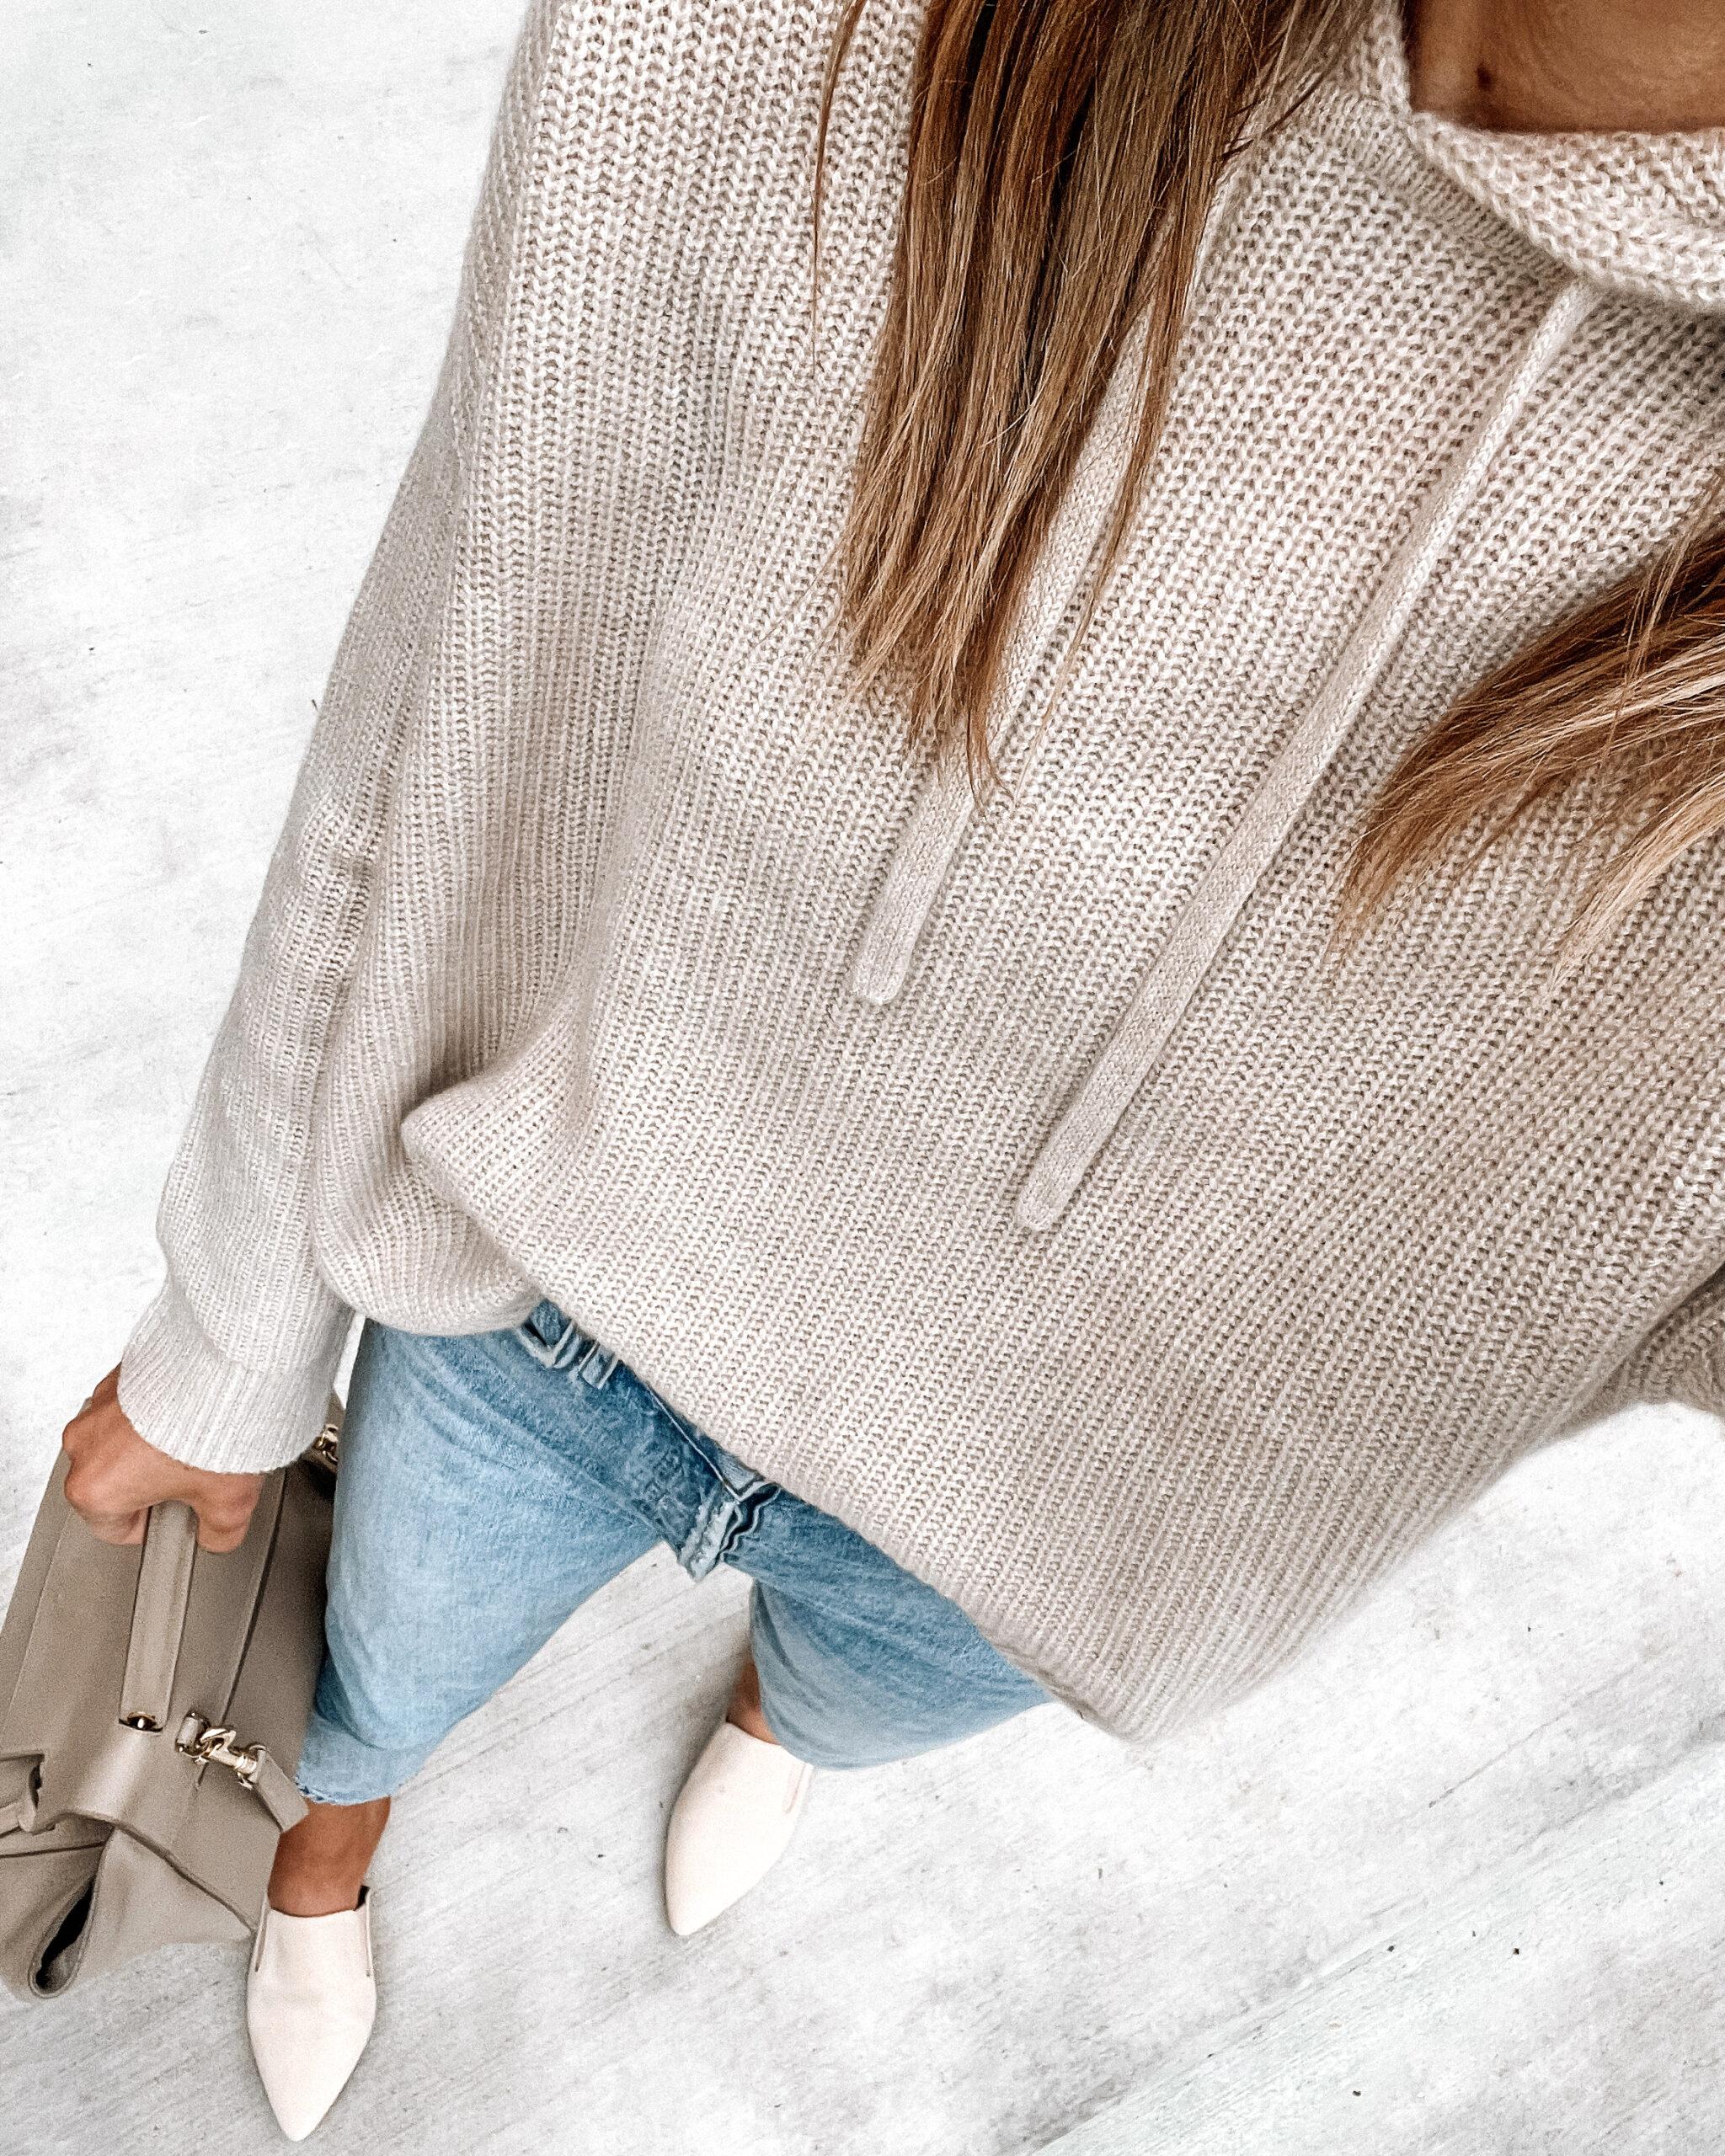 Fashion Jackson Wearing Jenni Kayne Oatmeal Fisherman Hoodie Cashmere Sweater Skinny Jeans